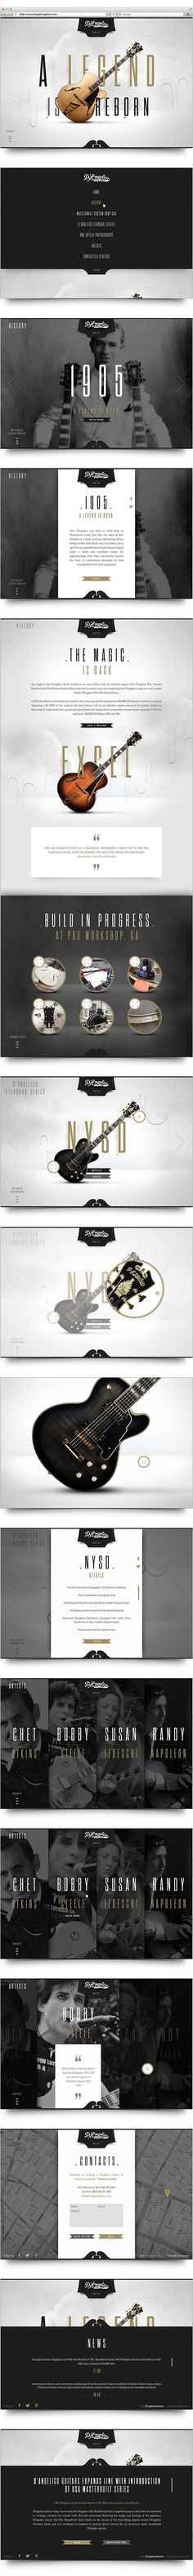 D'Angelico Guitars by Stella Petkova, via Behance Webdesign inspiration Design Typo, Logo Design, Typography Design, App Design, Layout Design, Web Layout, Mobile Design, Design Ideas, Brand Design